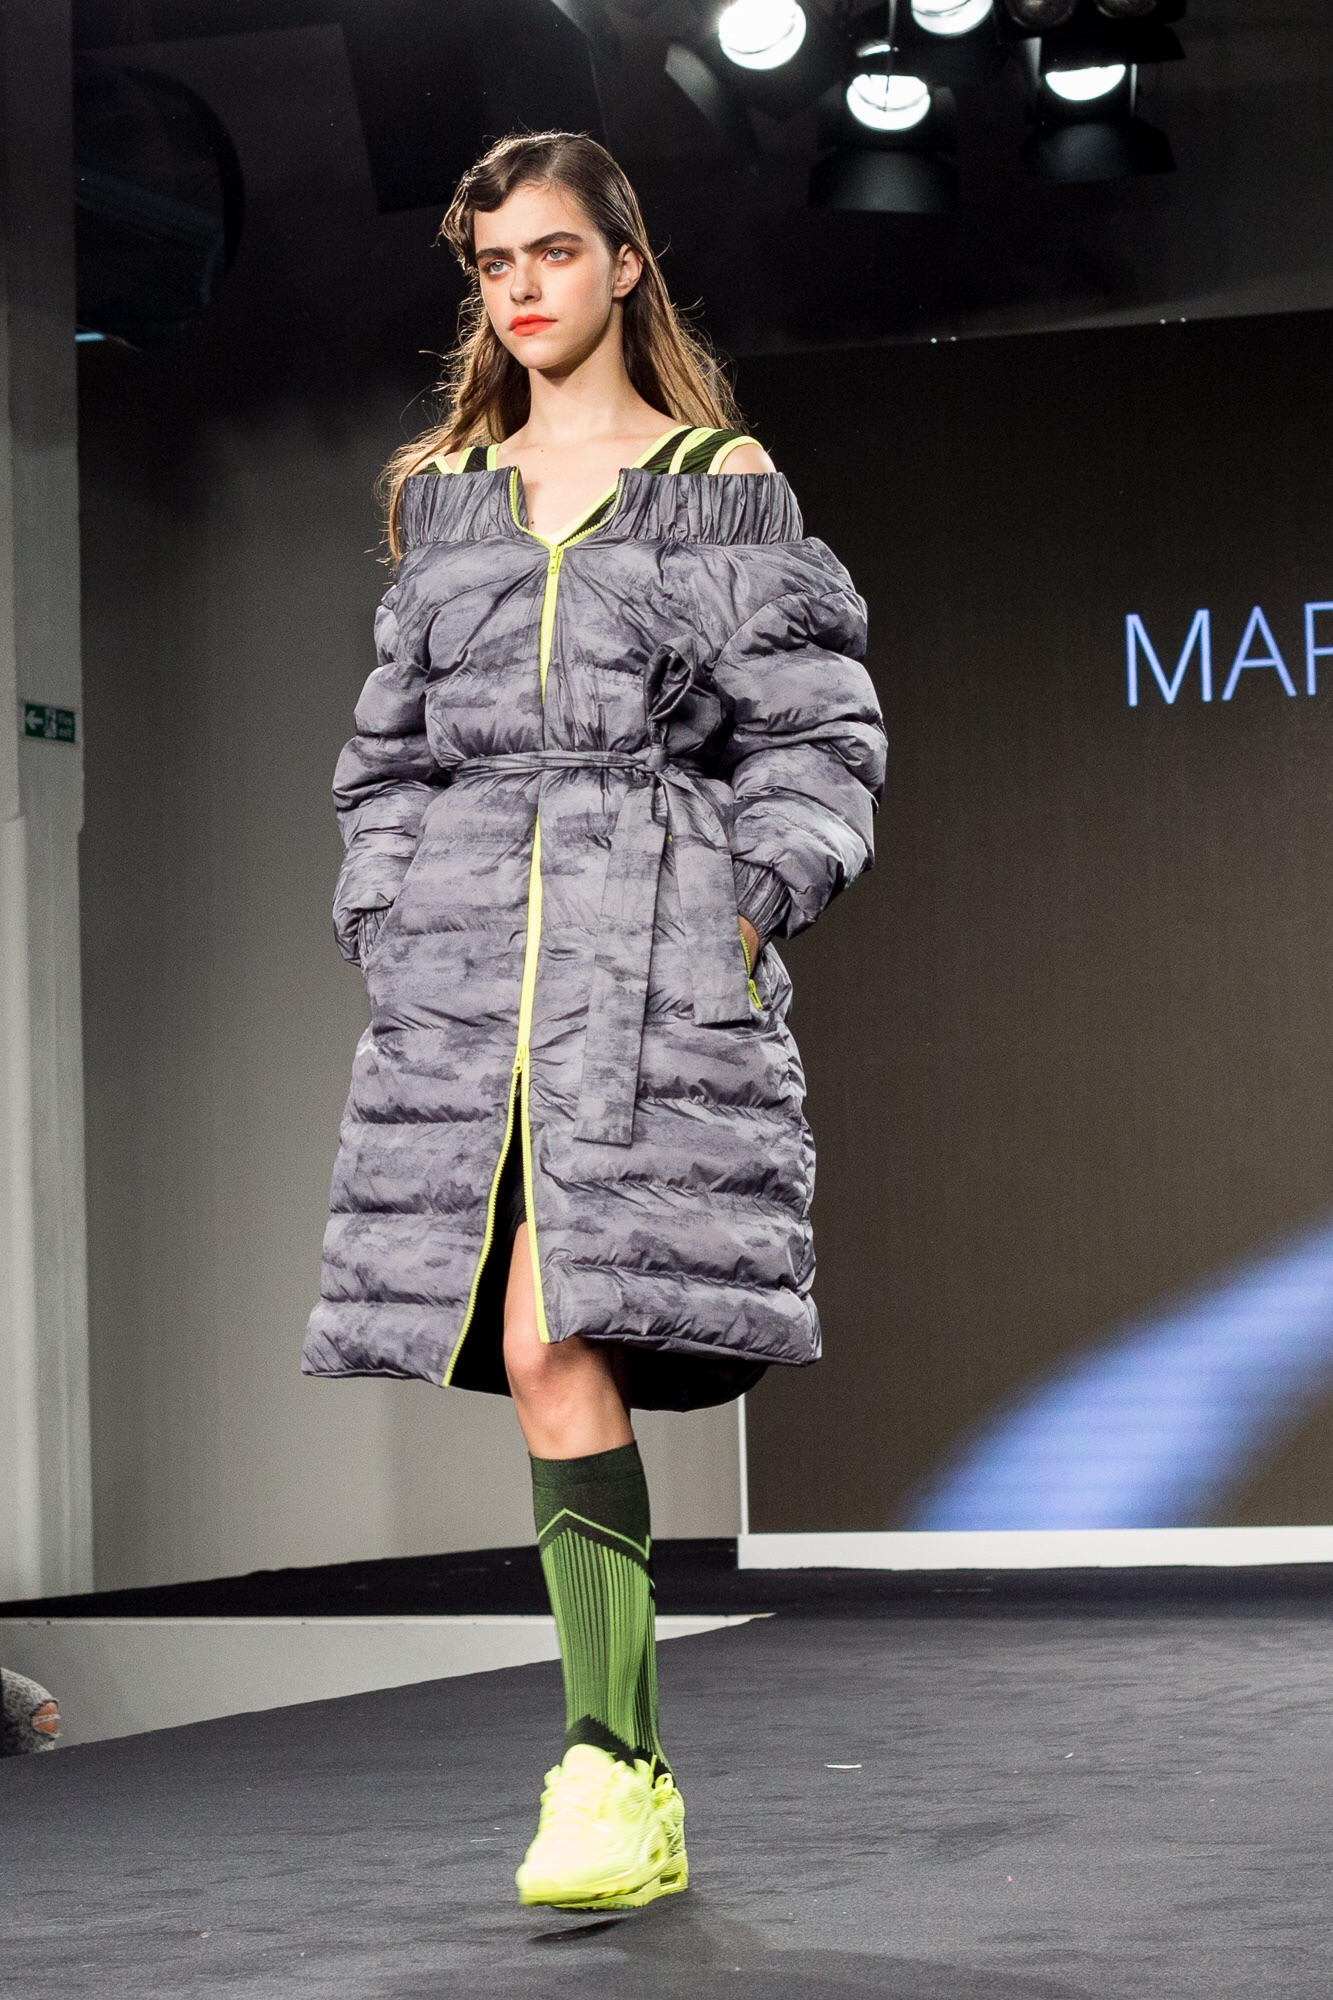 Margarita Davydova - off the shoulder puffa!